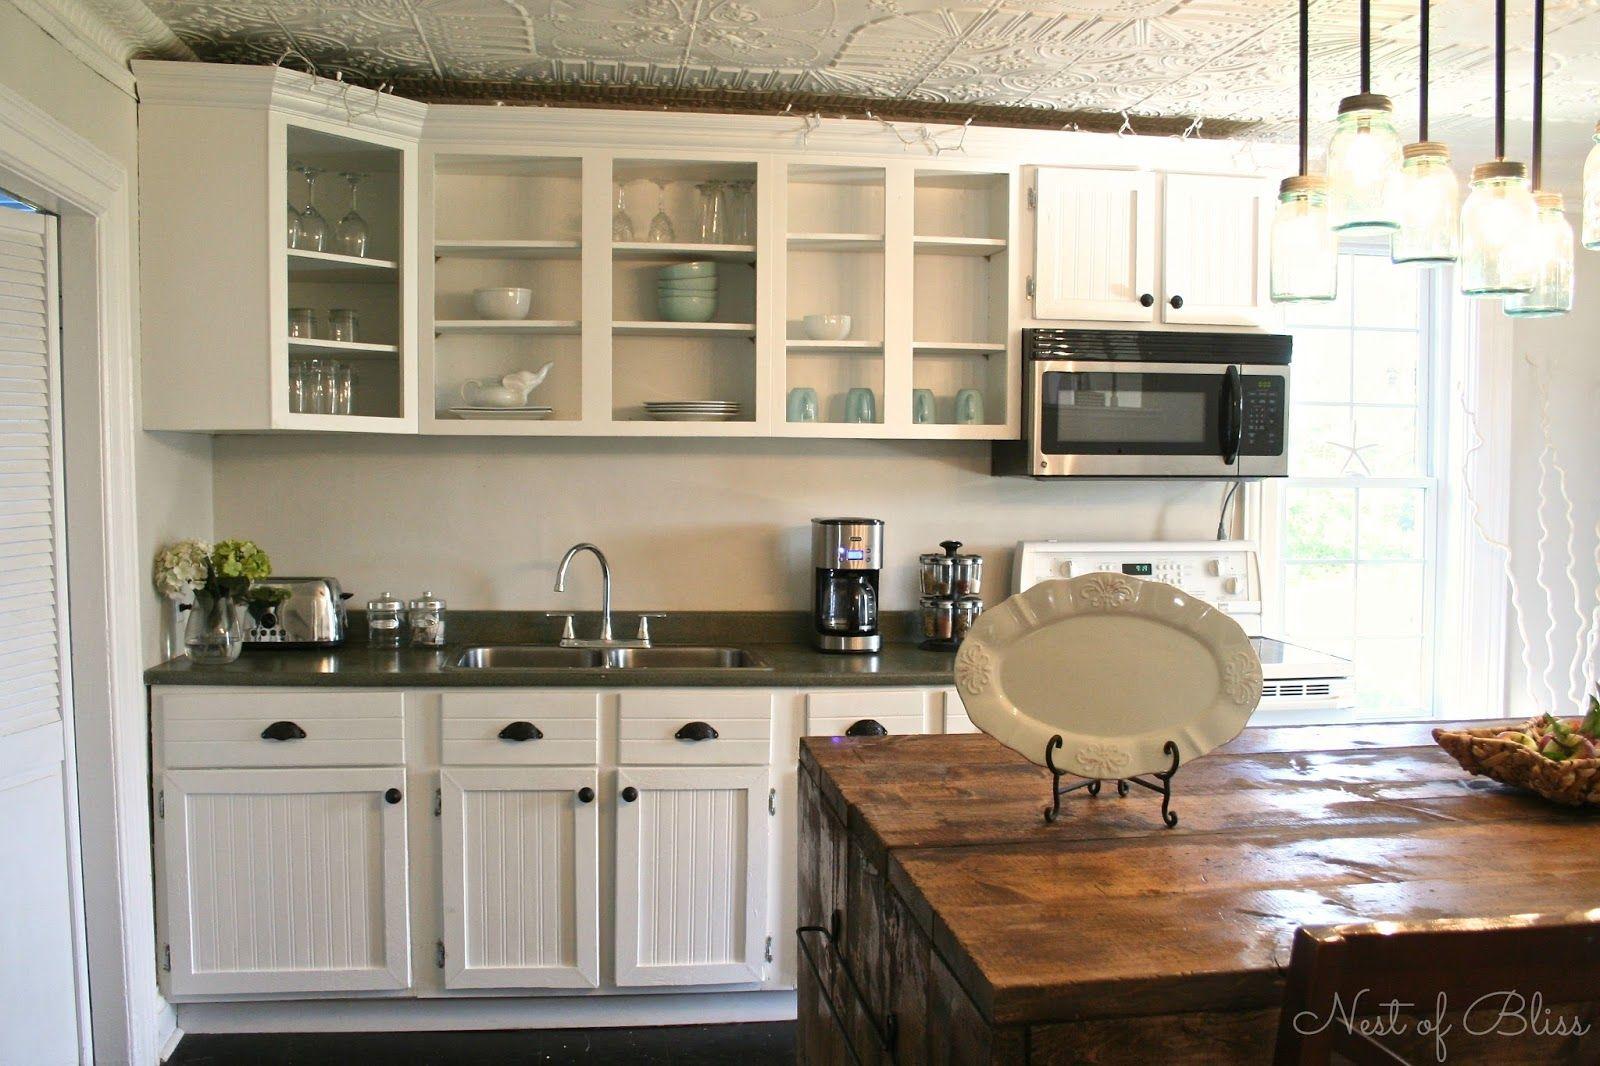 Captivating Get Decorating: Cabinet Doors | EFRAME · Budget Kitchen MakeoversKitchen ...